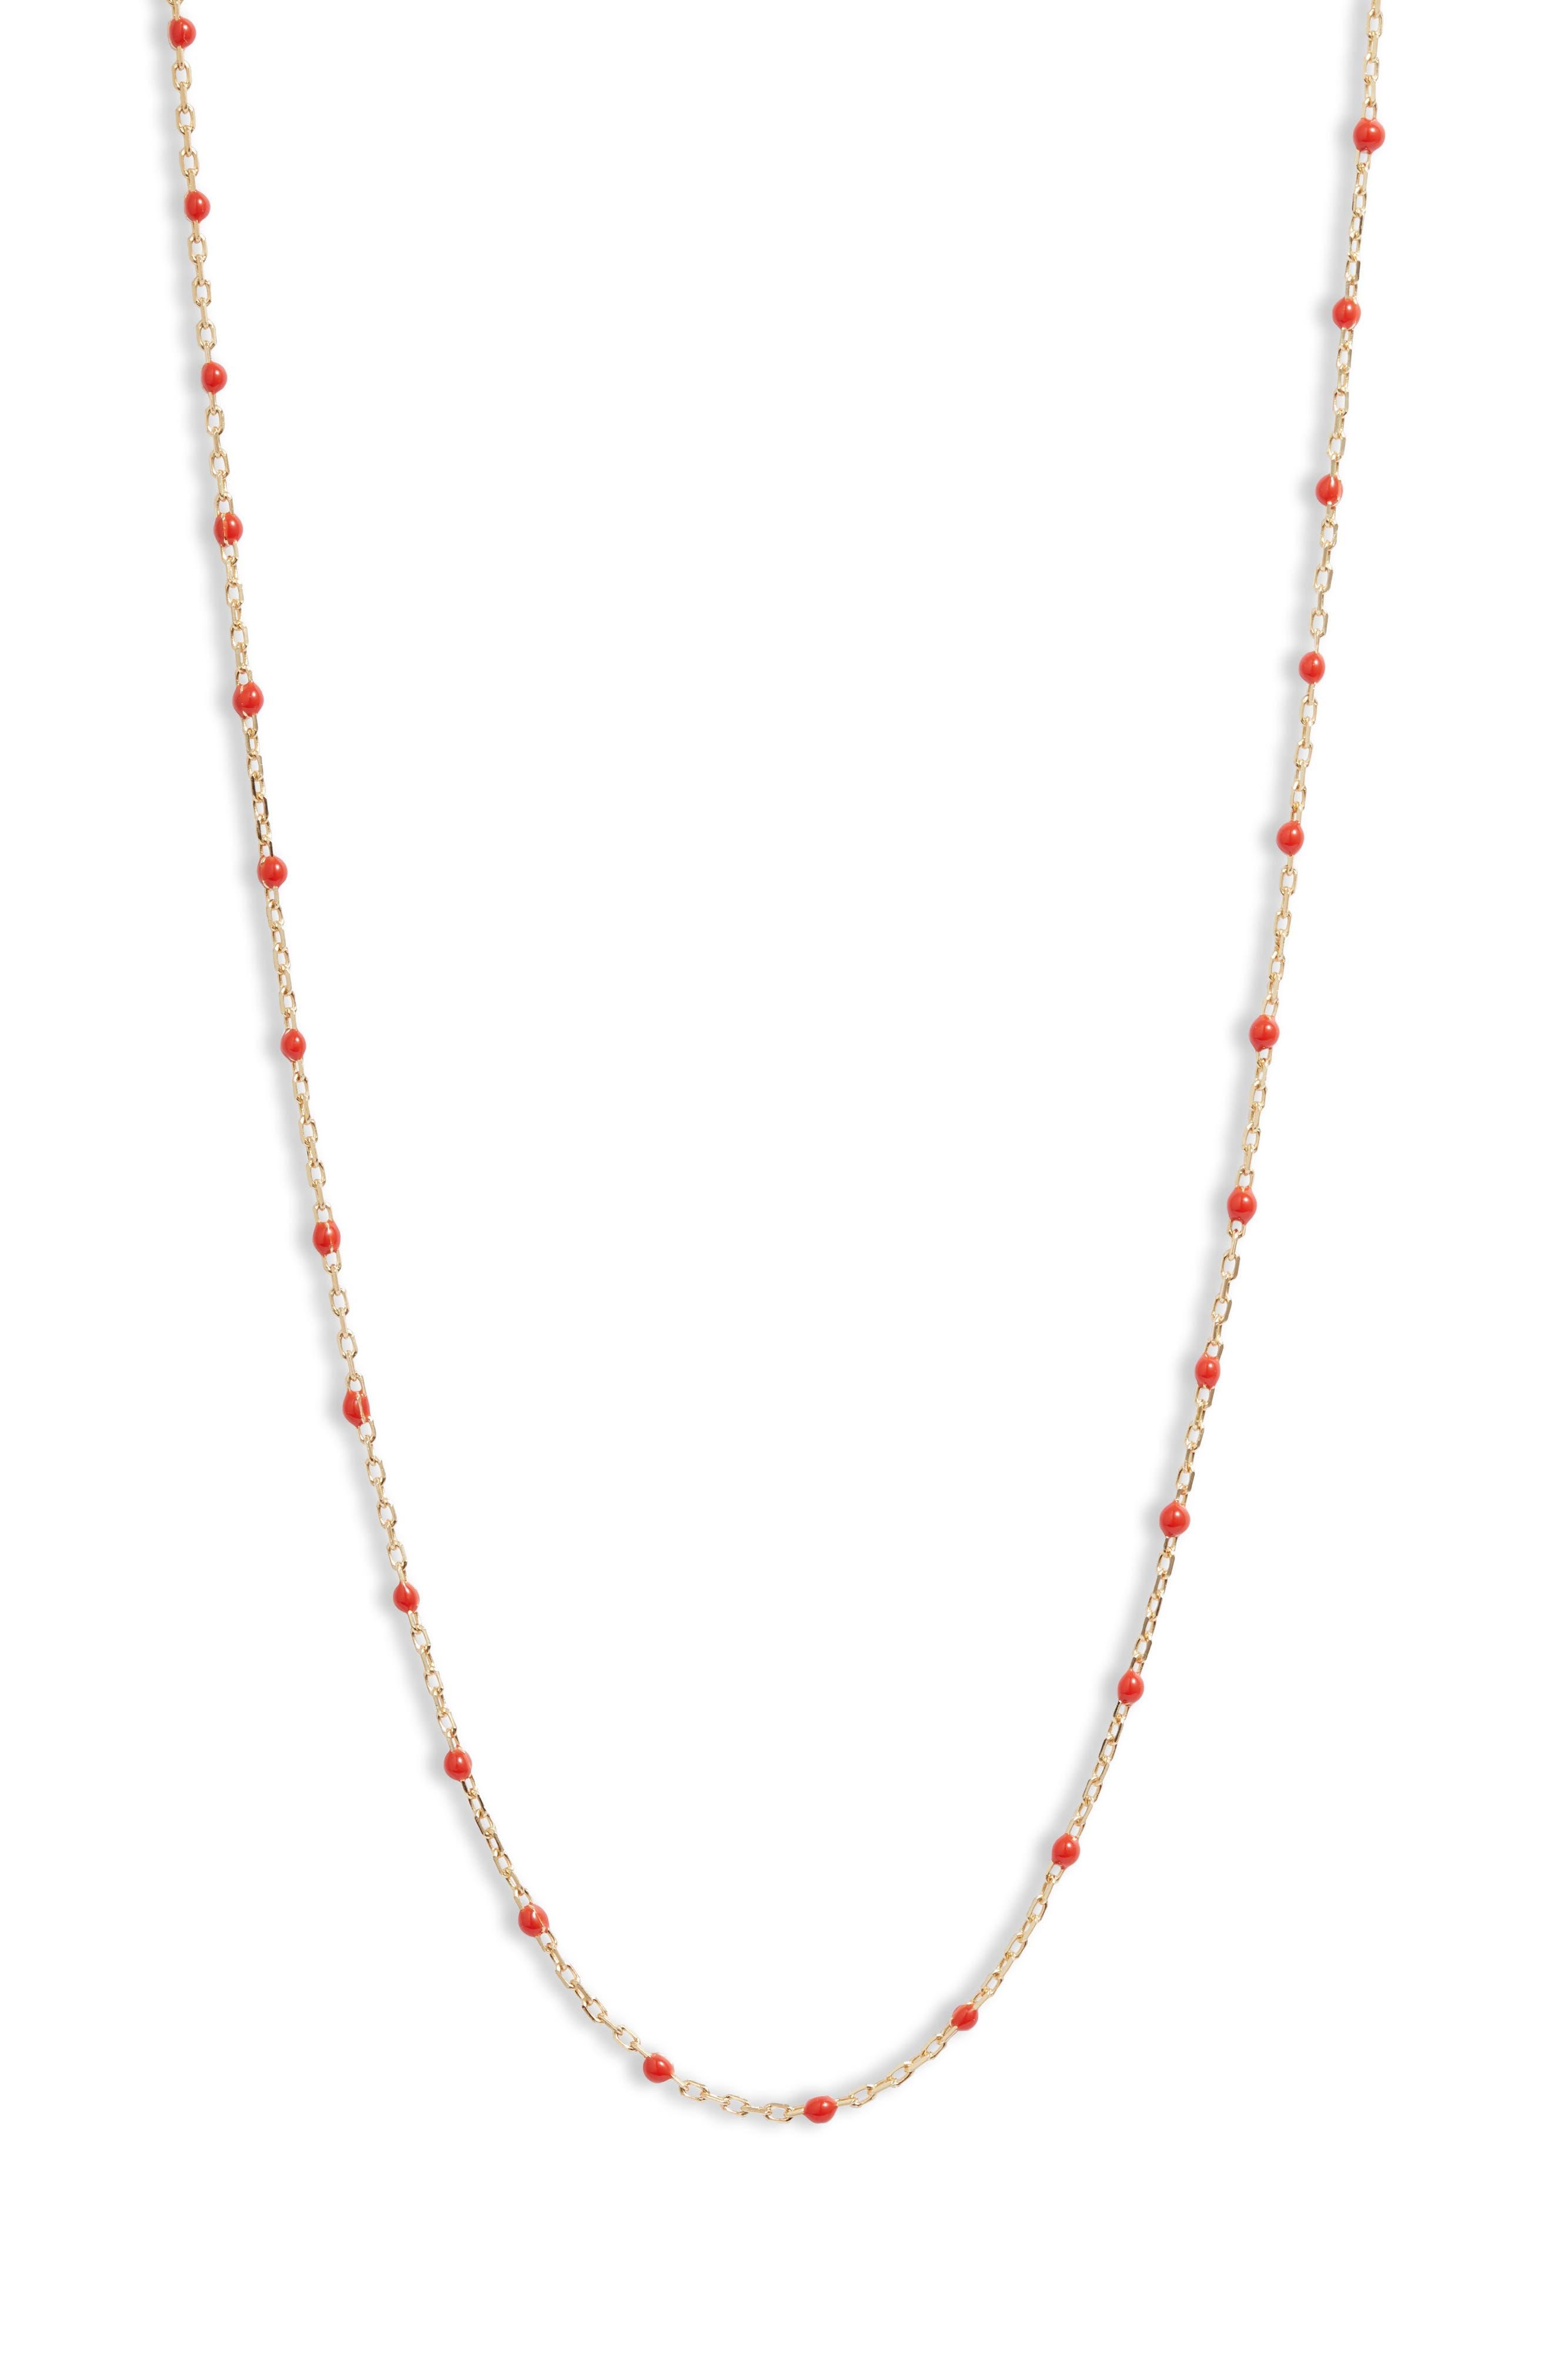 Black Enamel Bead Station Necklace